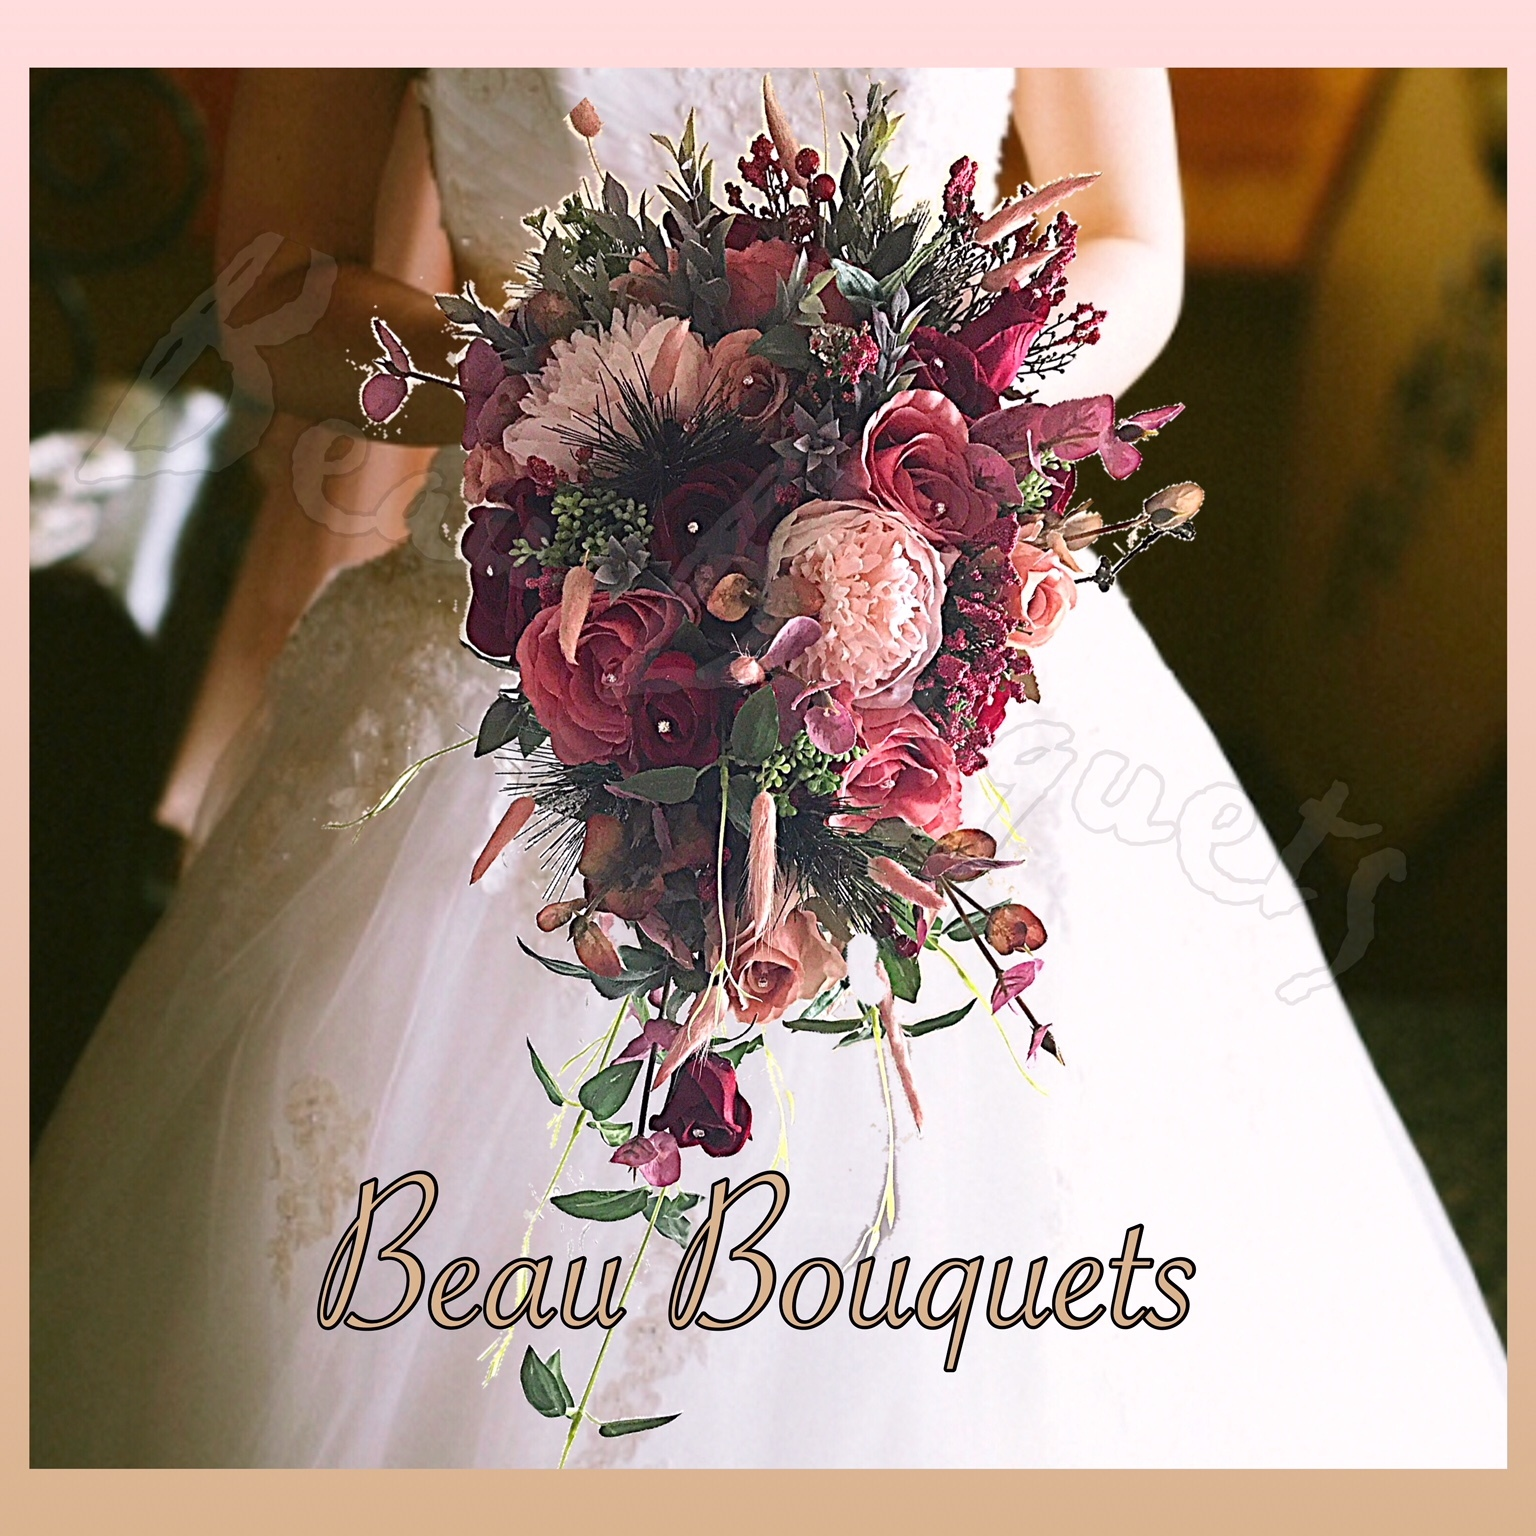 TRUE LOVE - CASCADE BRIDE BOUQUET Wintry burgundy & dusky pink roses, spruce, fir cones, berries adn dusky green foliage